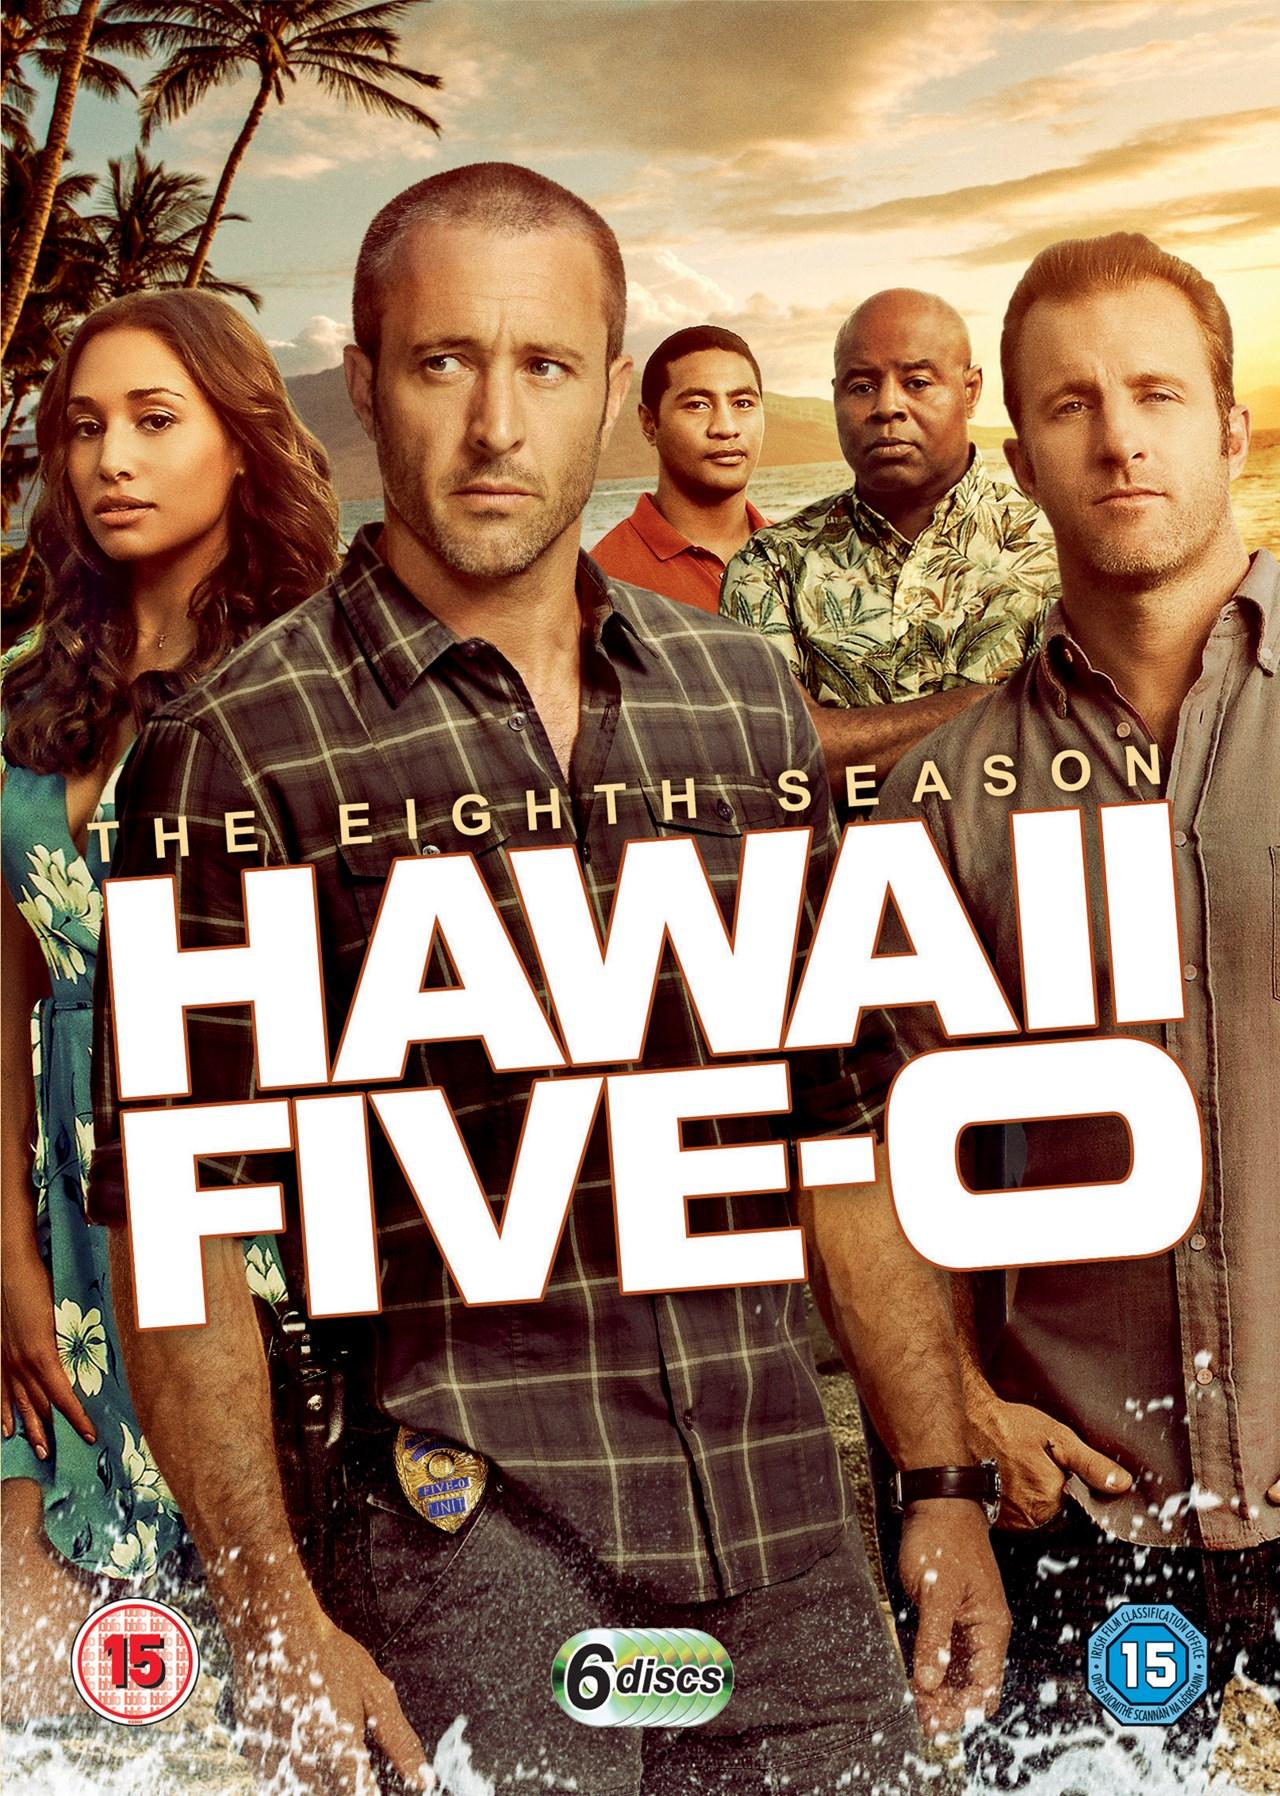 Hawaii Five-0: The Eighth Season - 1